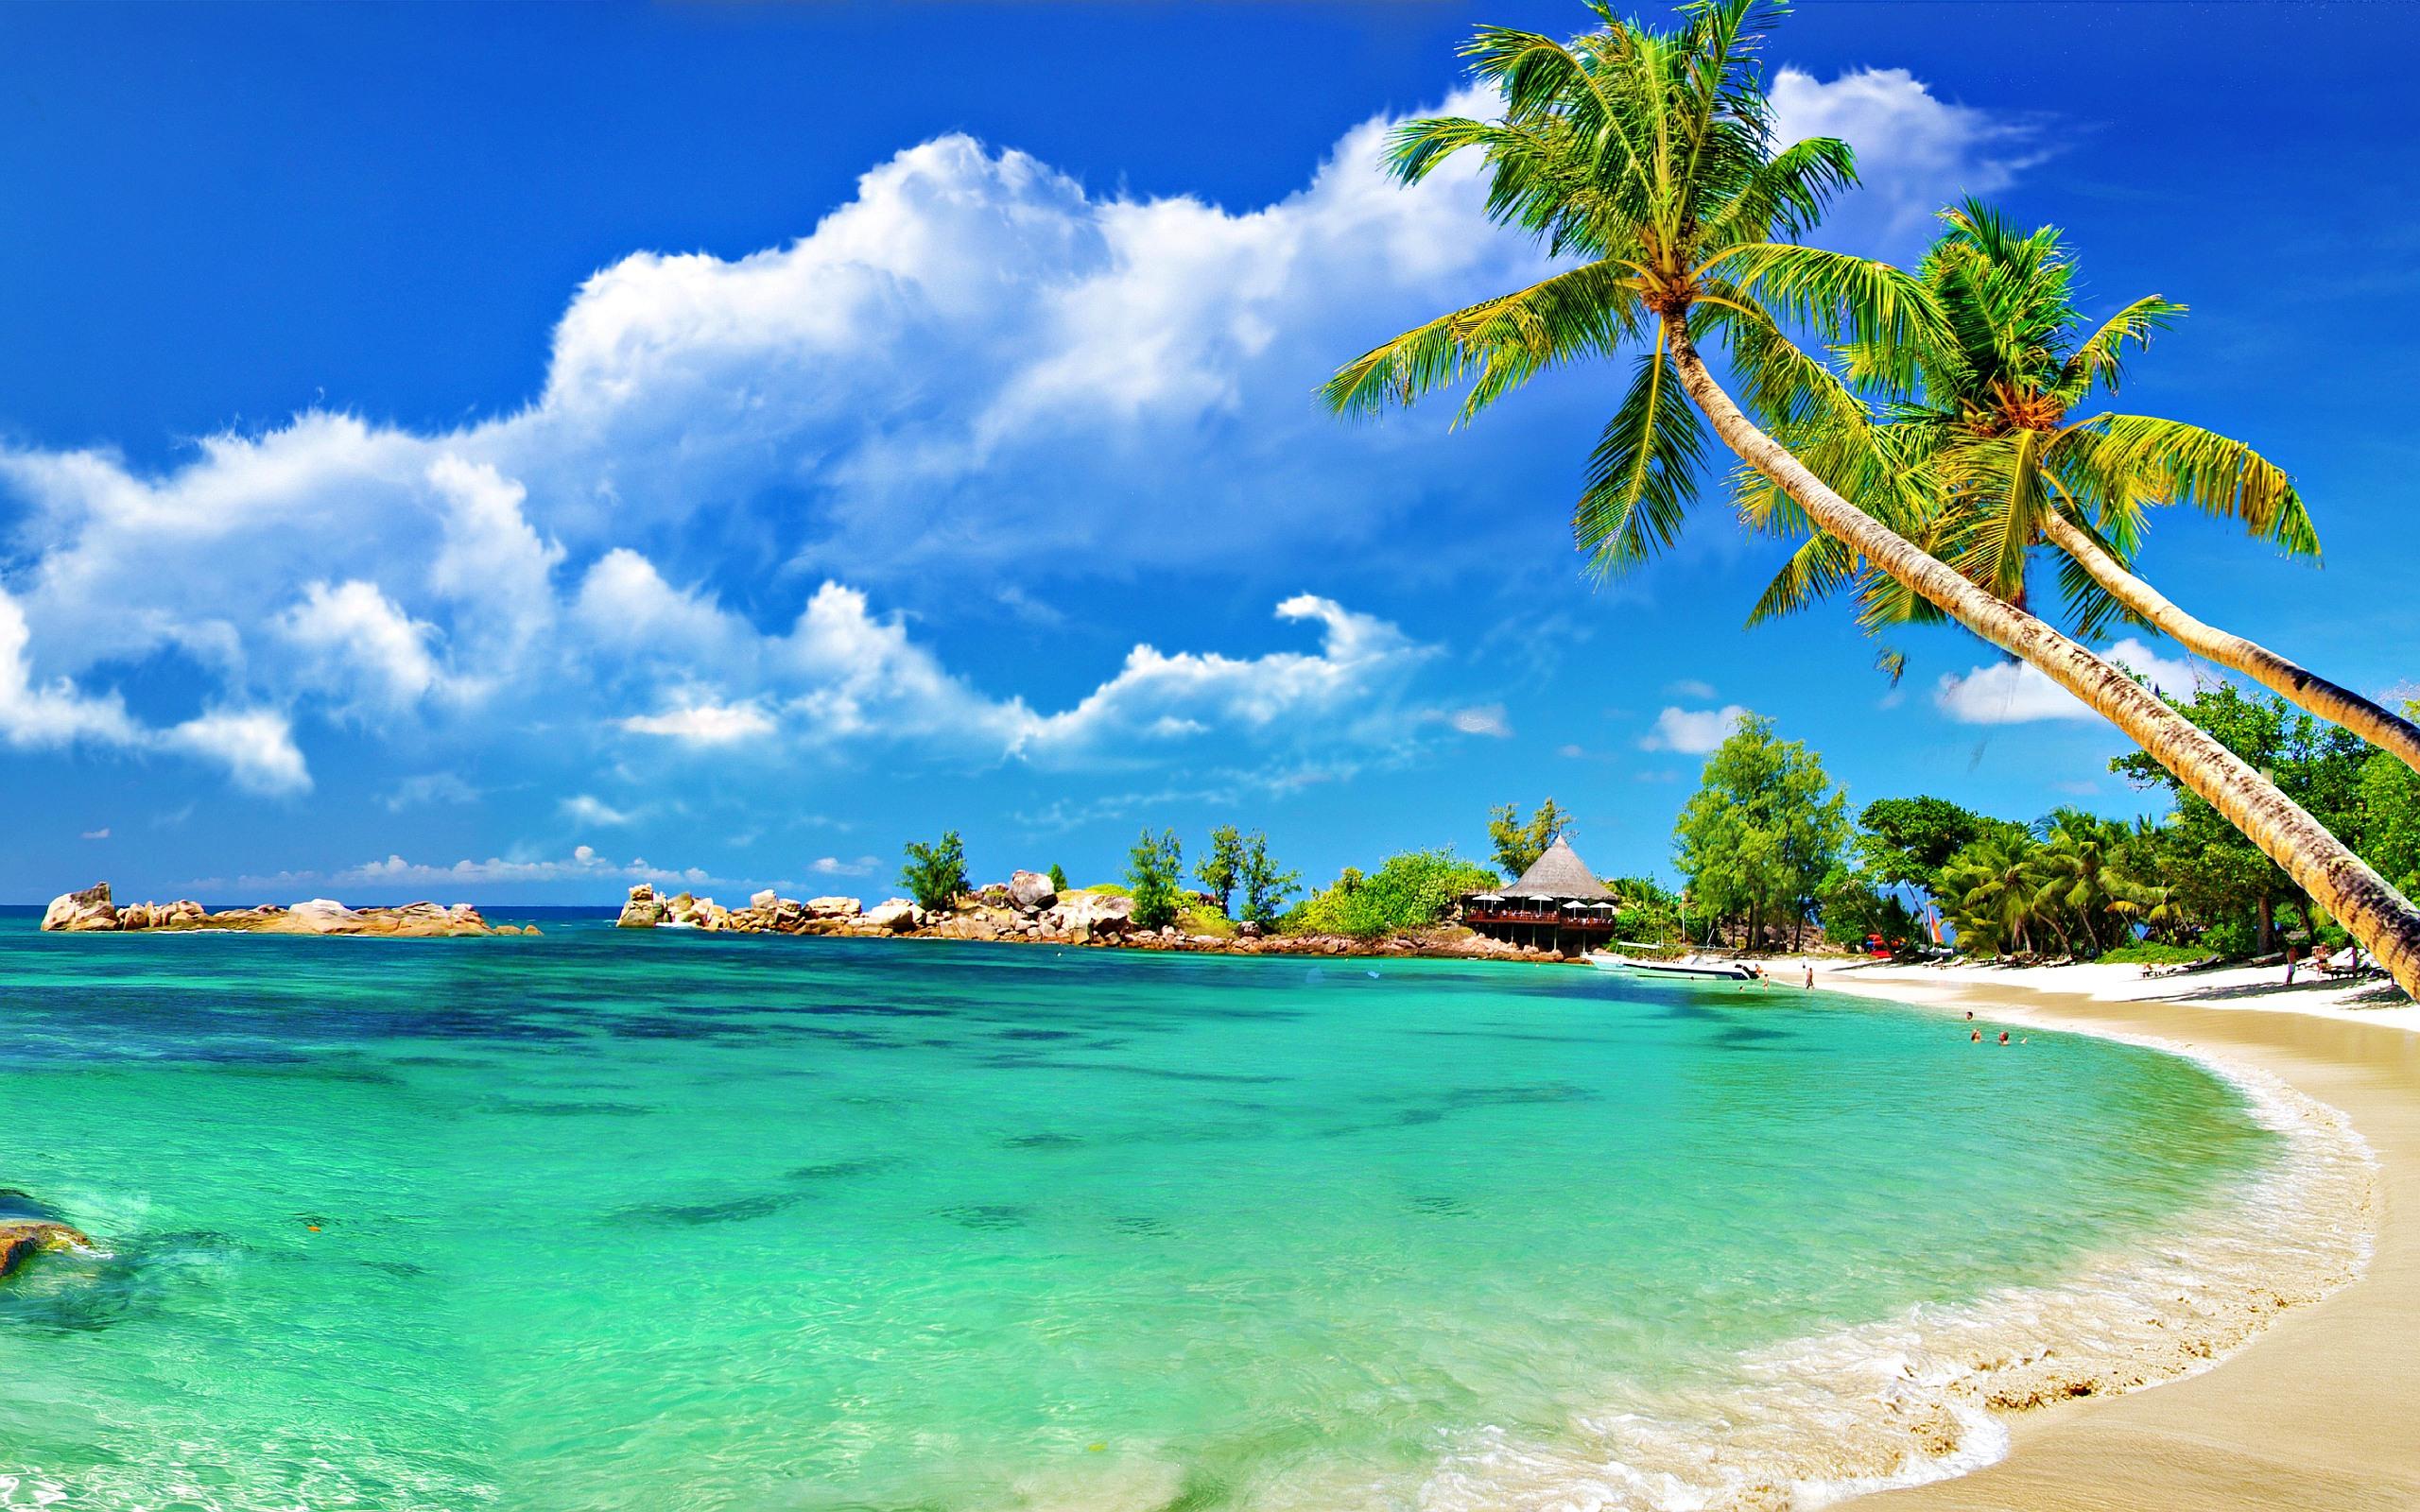 Free Download Beach Background Wallpaper 1080p 6948220 2560x1600